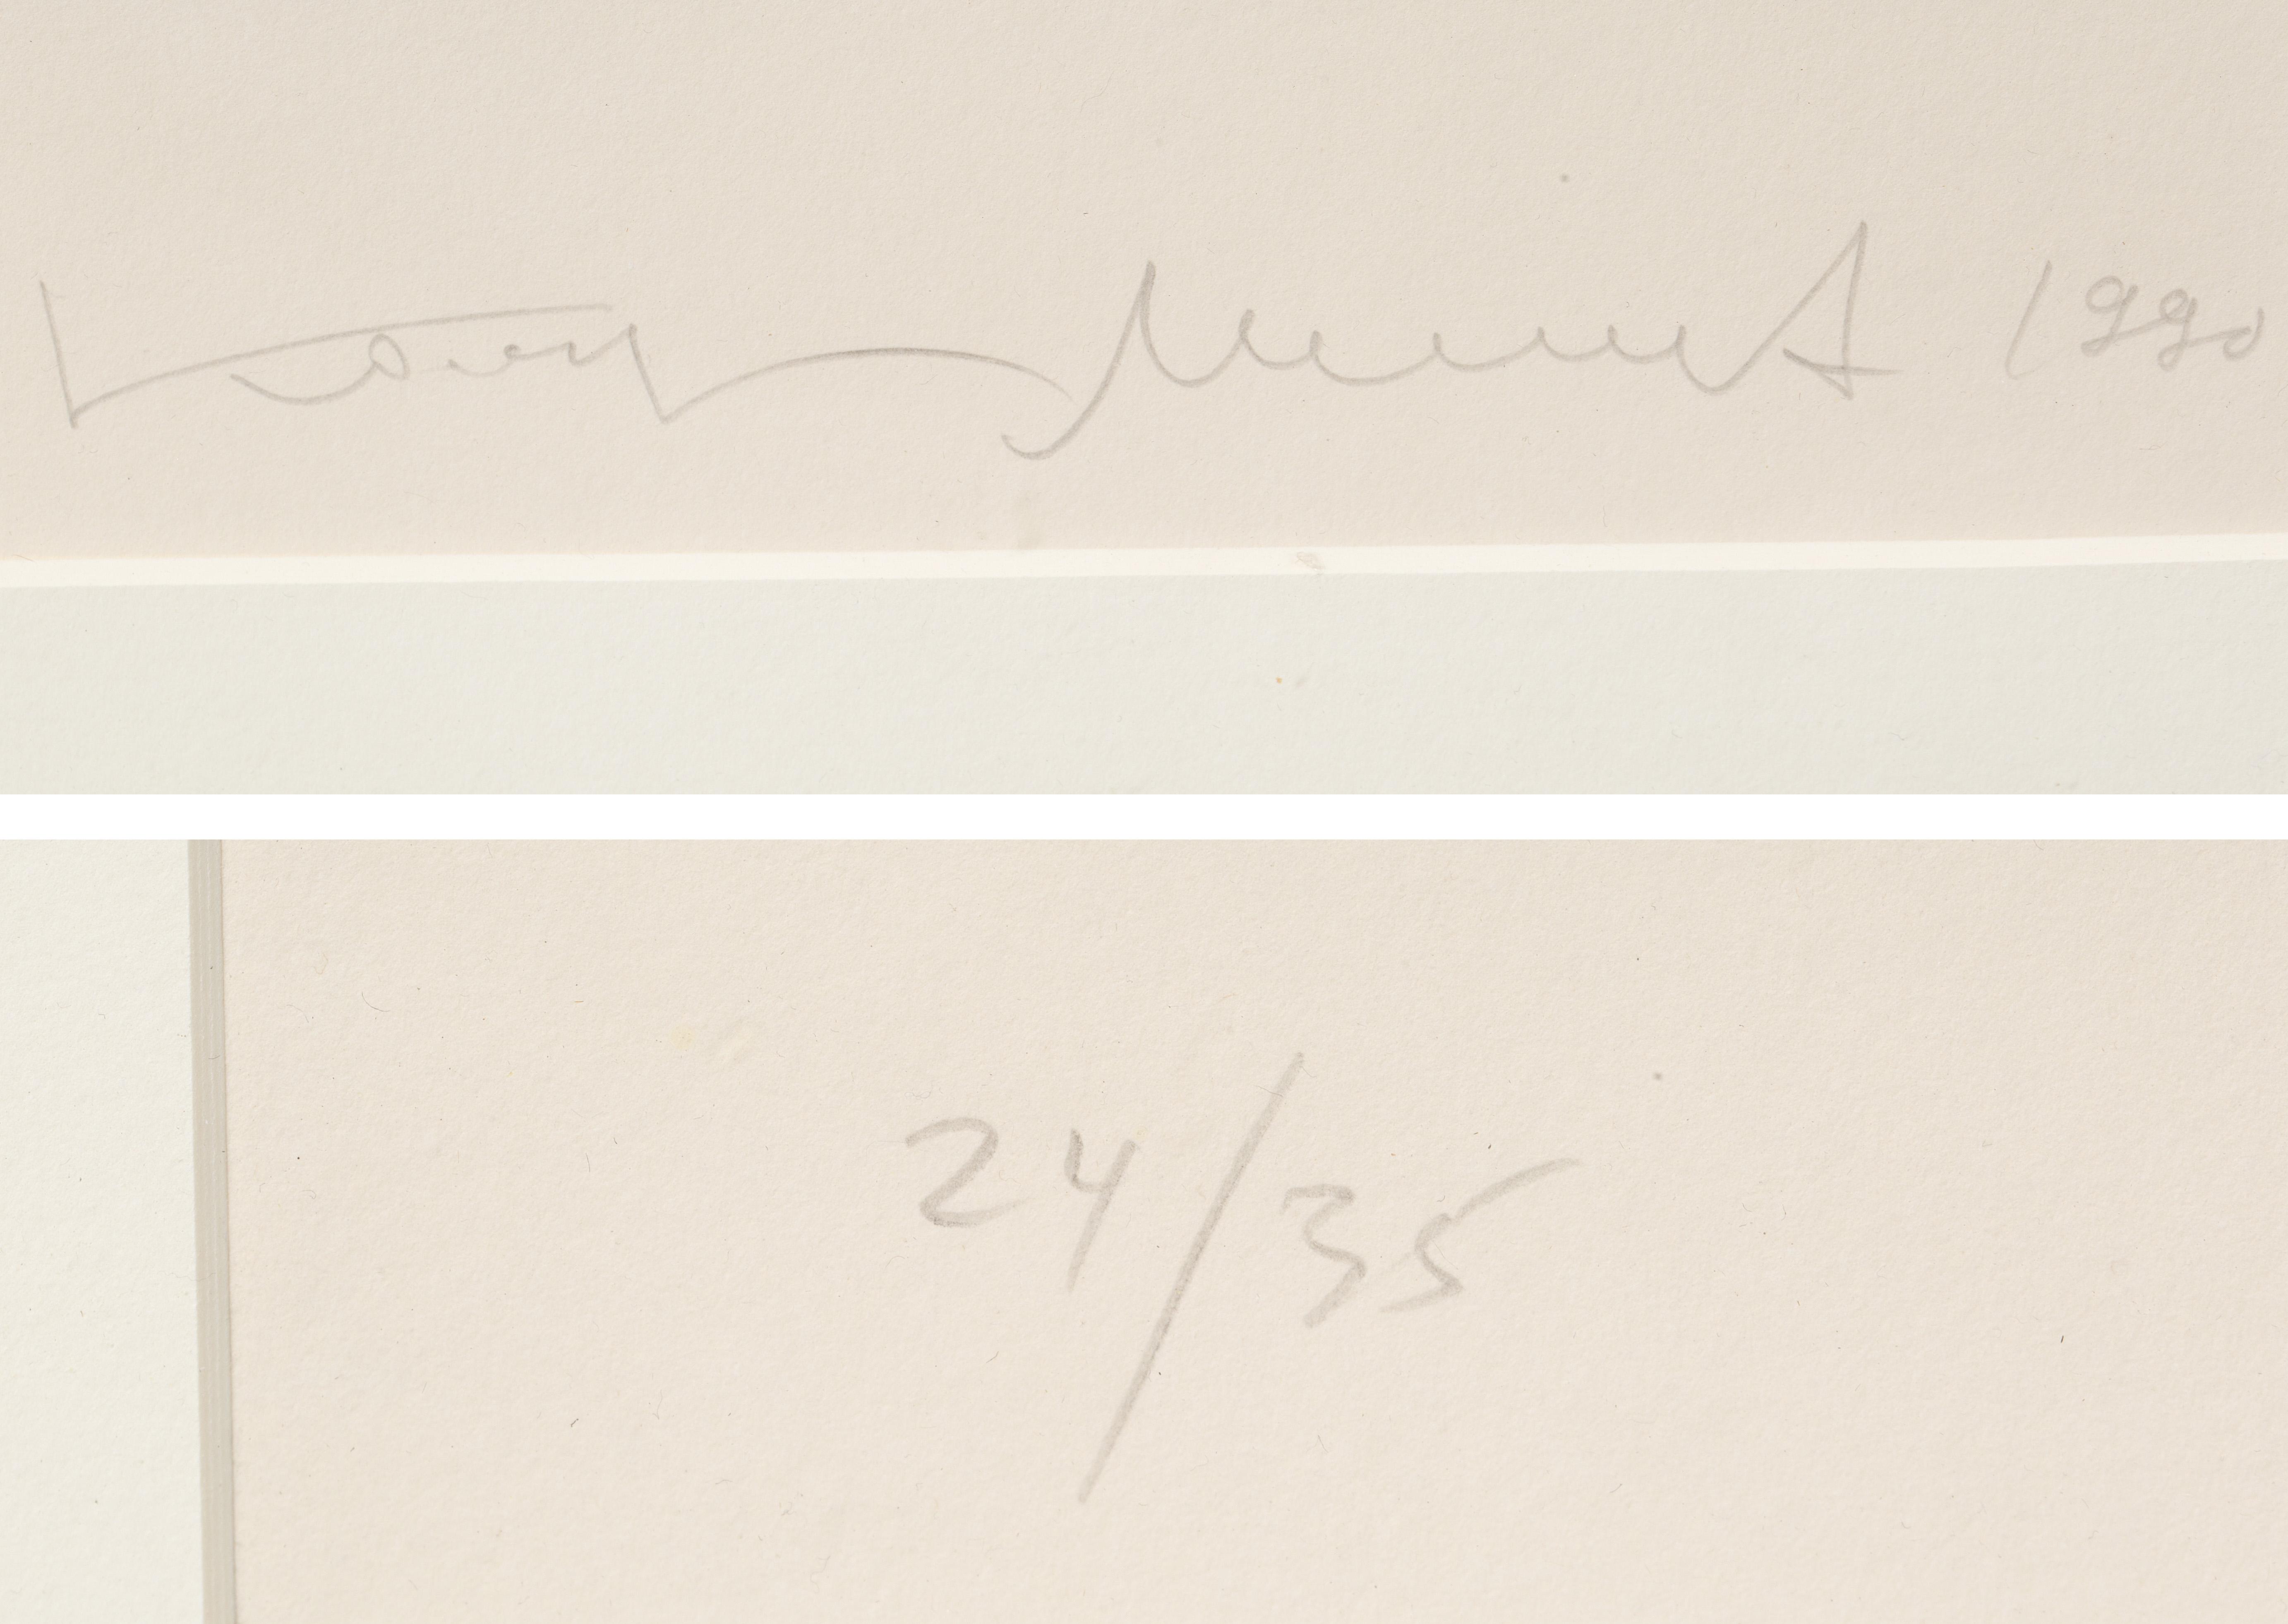 KOMAR AND MELAMID [VITALY KOMAR (RUSSIAN B. 1943) AND ALEXANDER MELAMID (B. 1945)] - Image 3 of 4